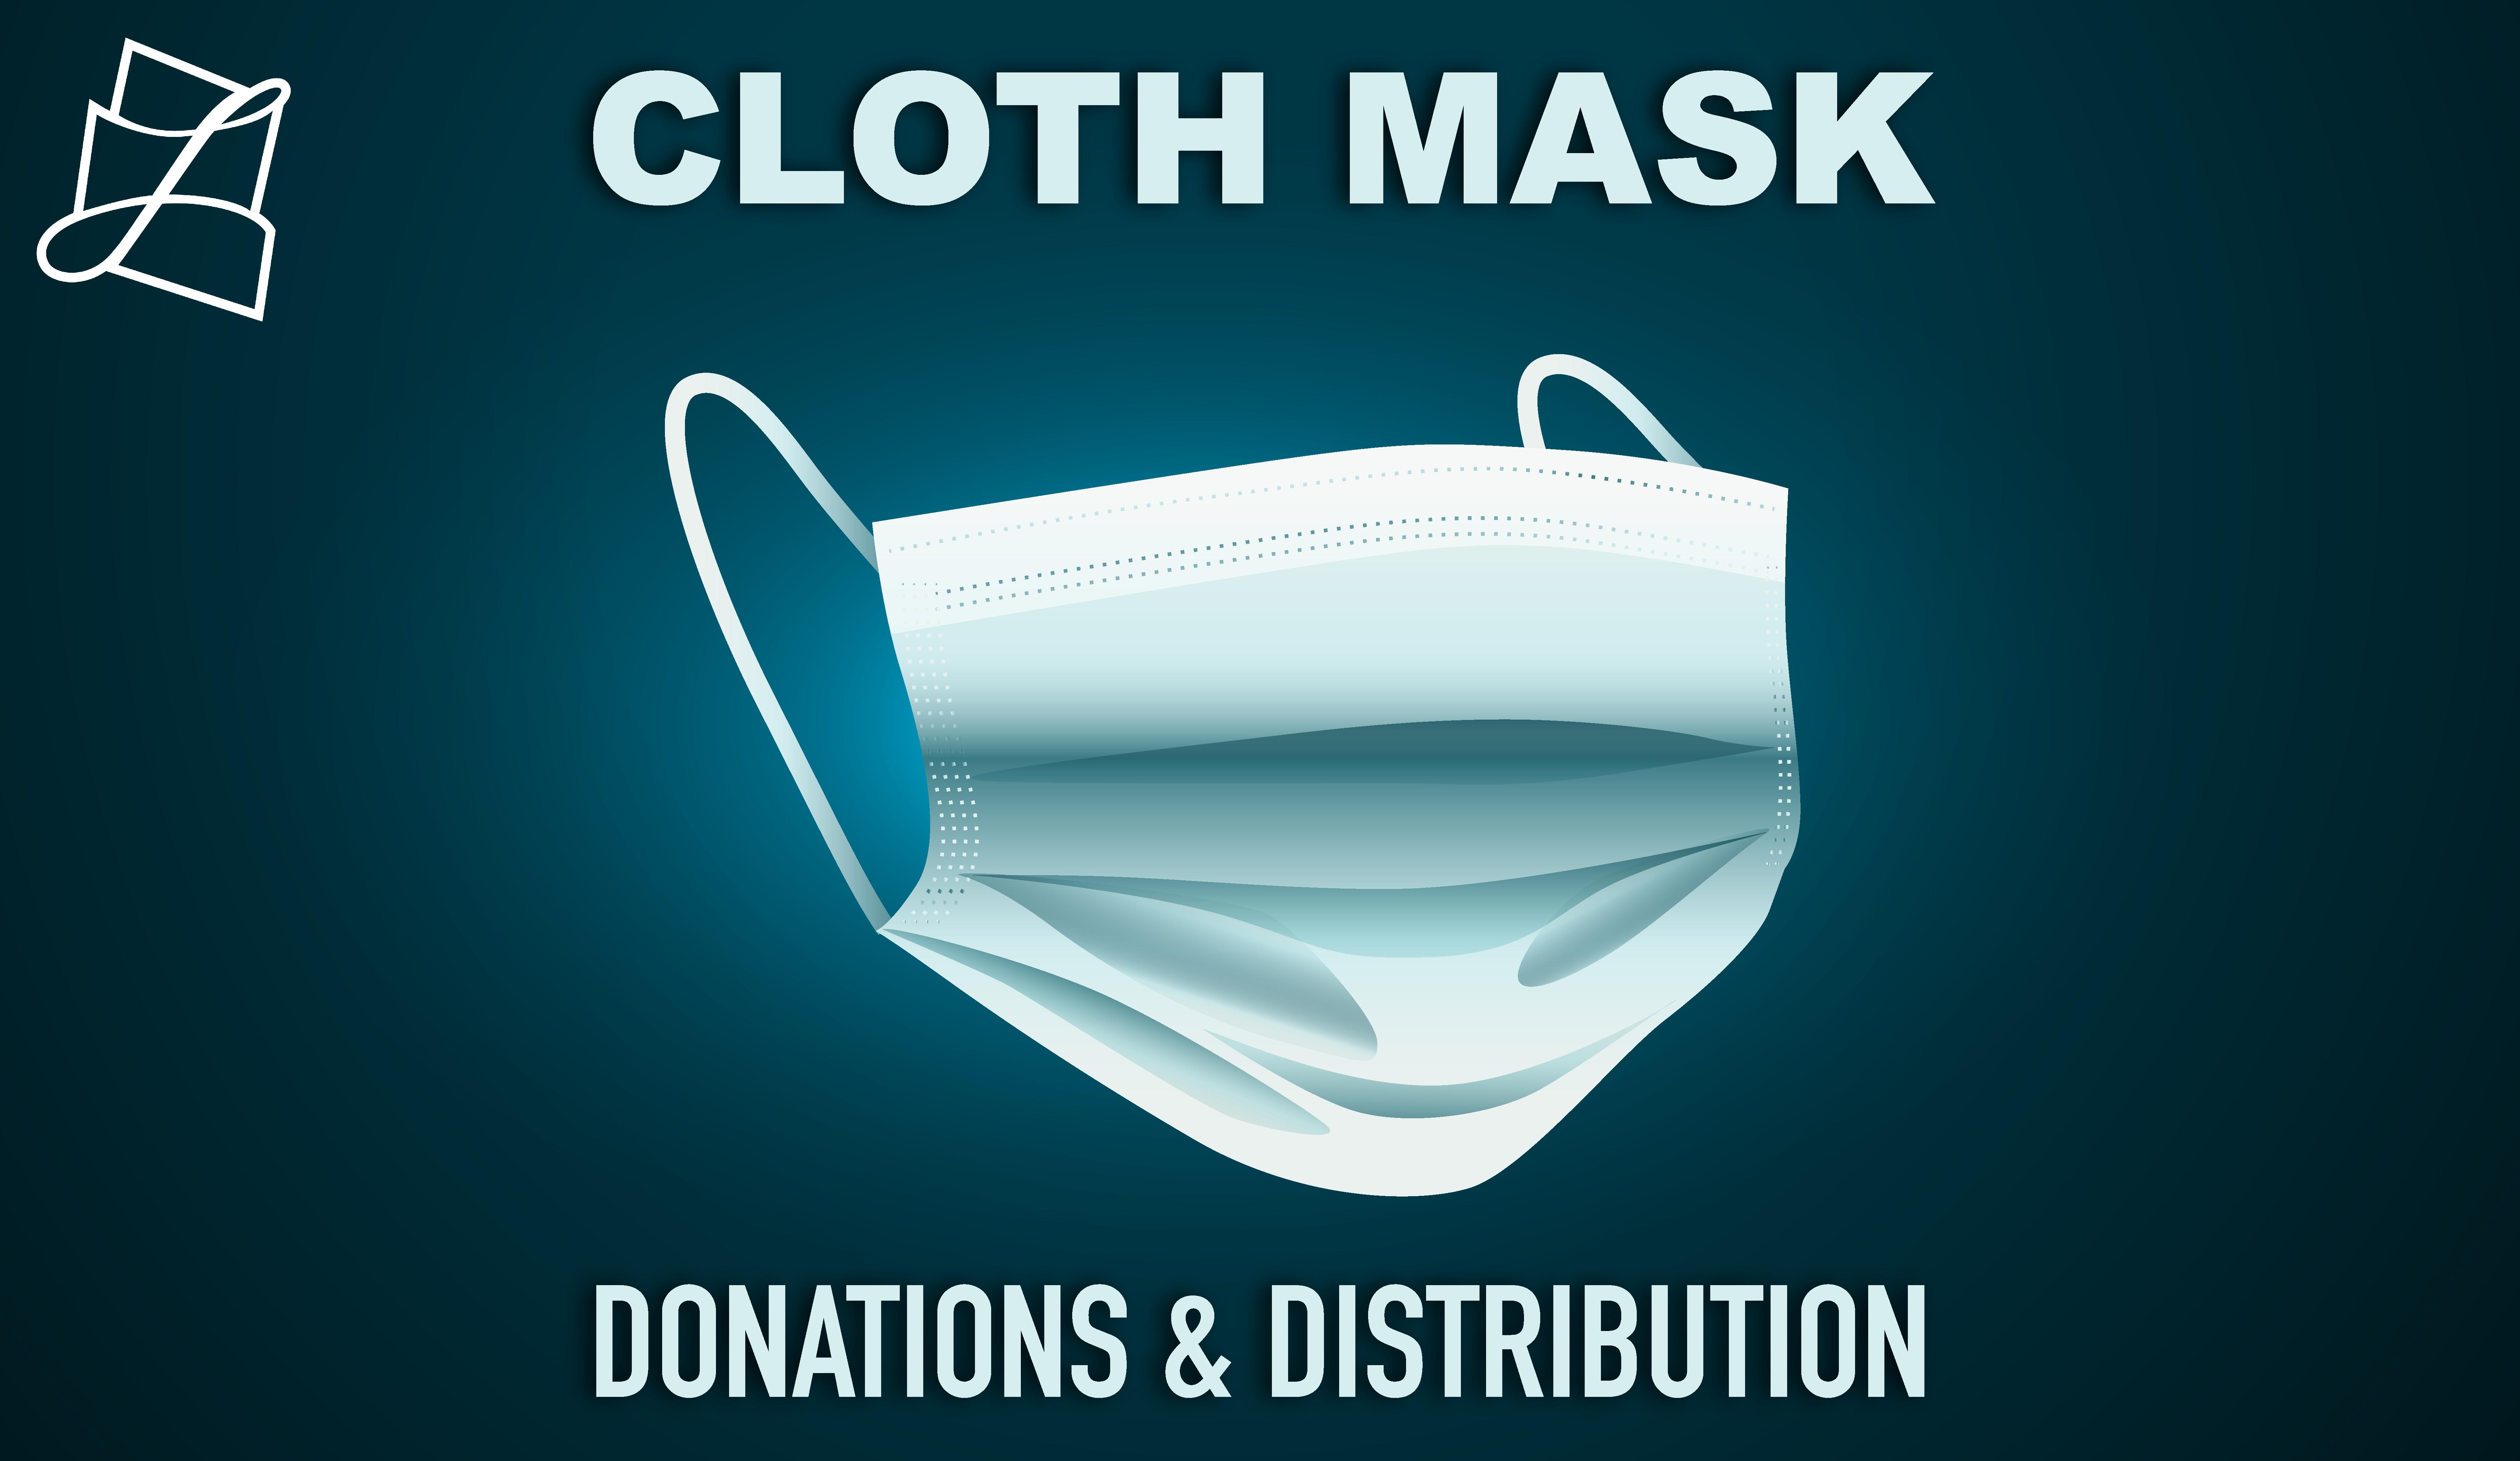 Mask Distribution & Donations in Lafayette Parish